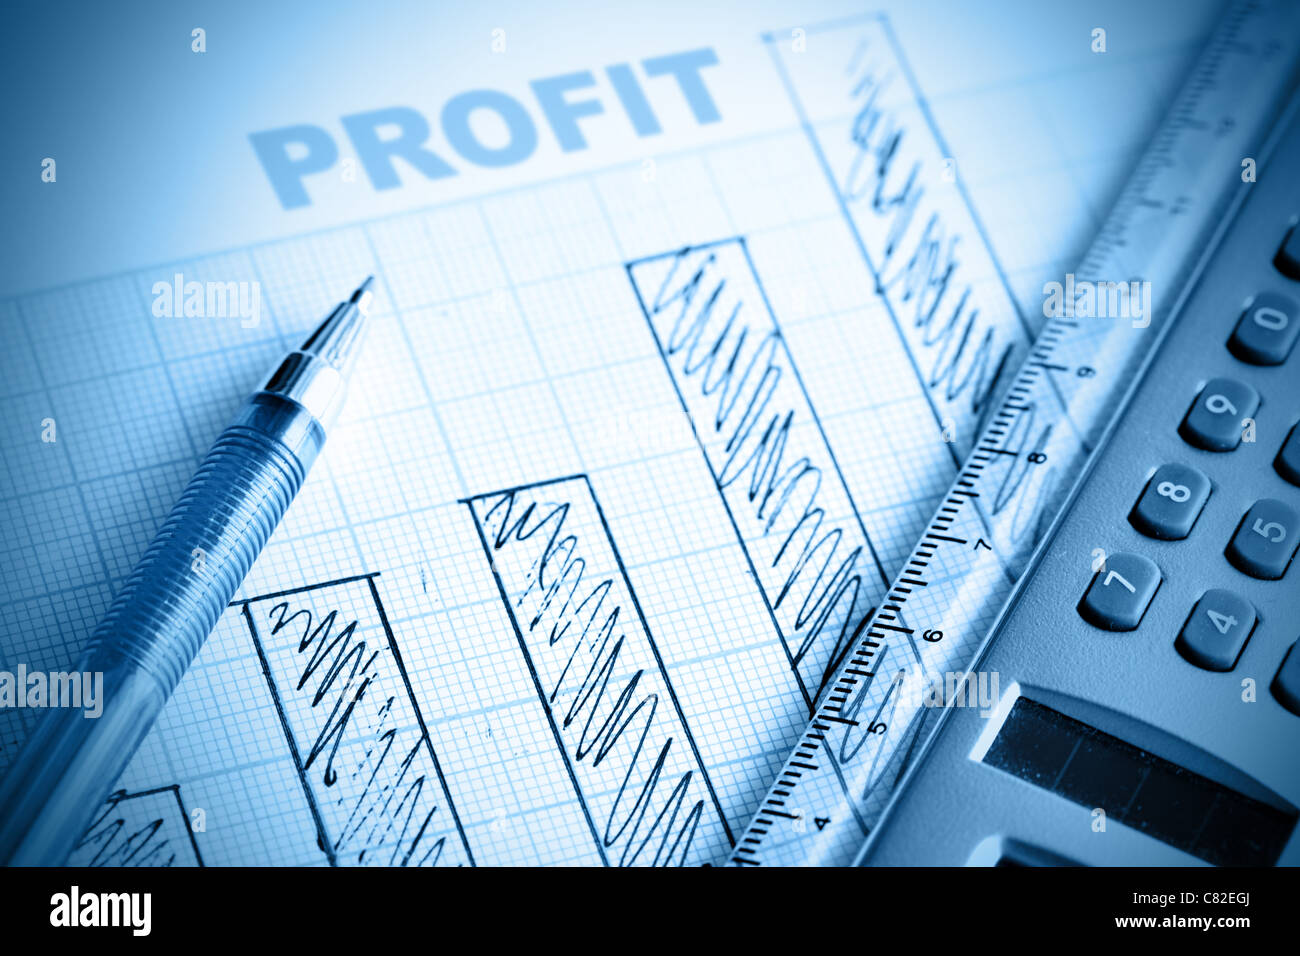 Profit bar chart pen and calculator shallow dof stock photo profit bar chart pen and calculator shallow dof ccuart Gallery